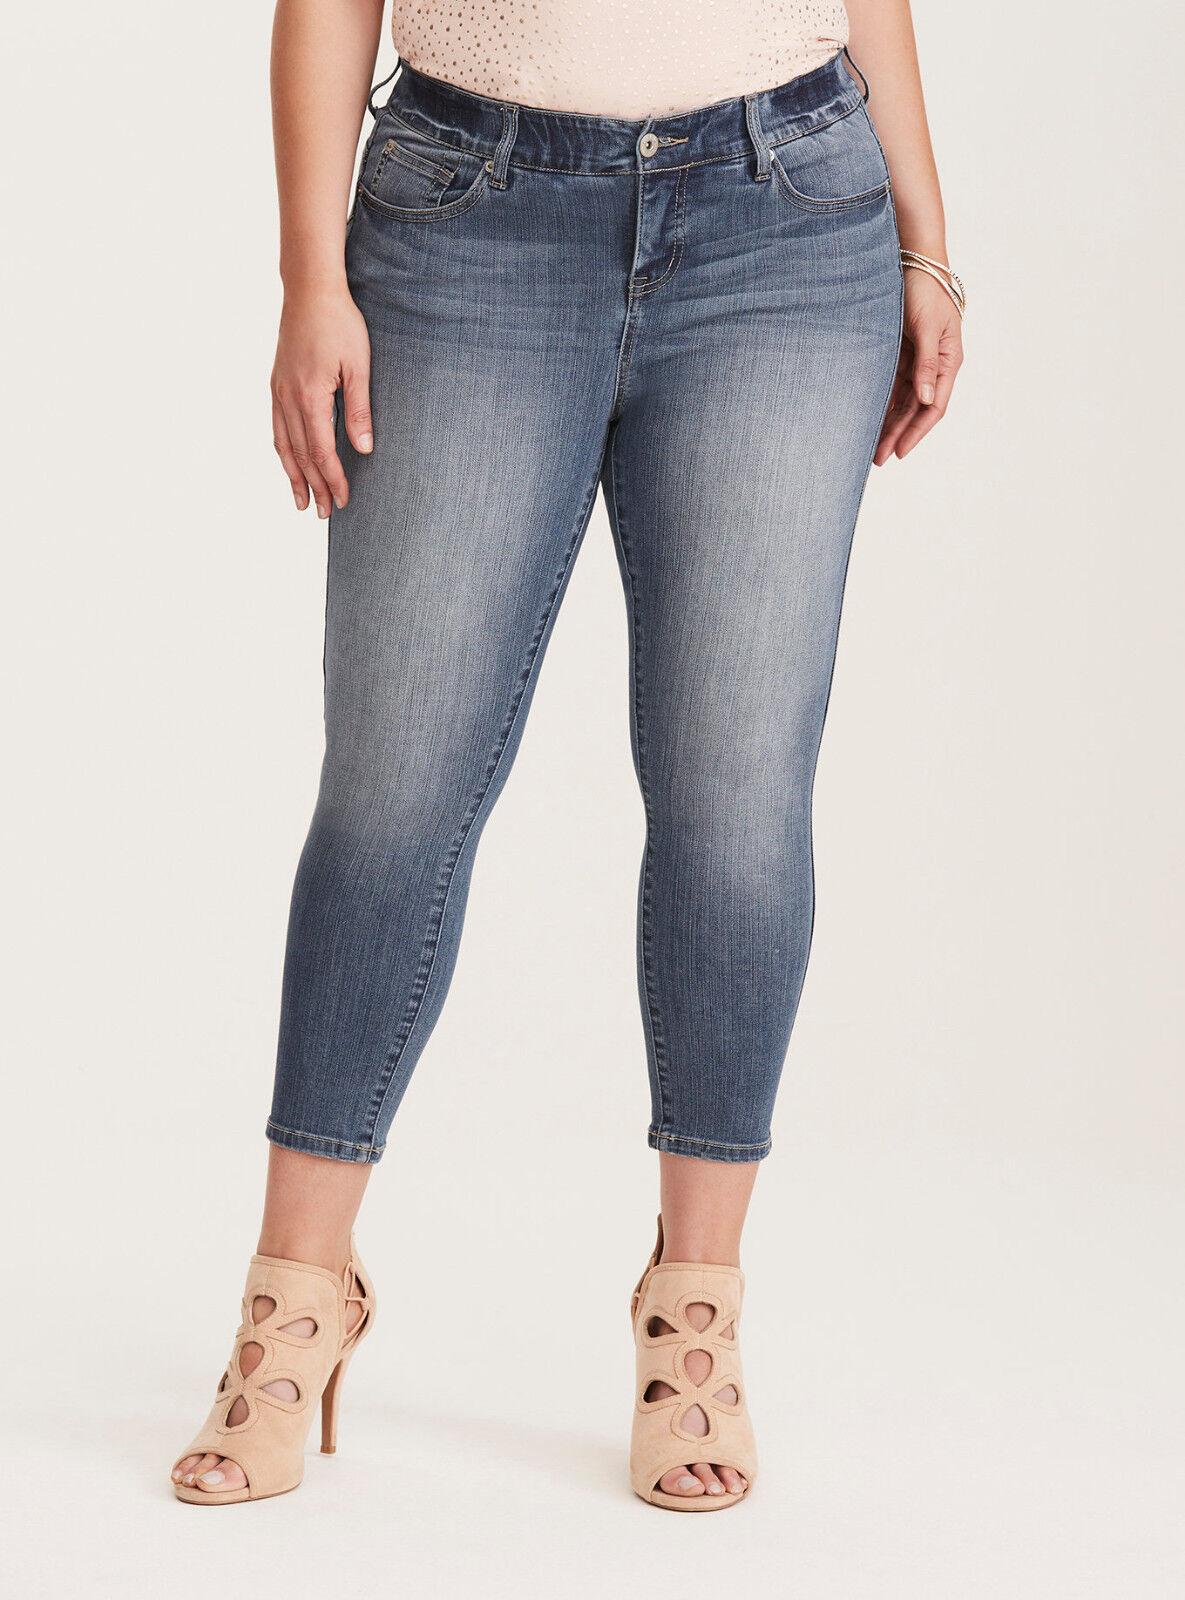 TORRID Premium Stretch Bombshell Cropped Skinny Jeans - Medium Wash   Sz 20 NWT